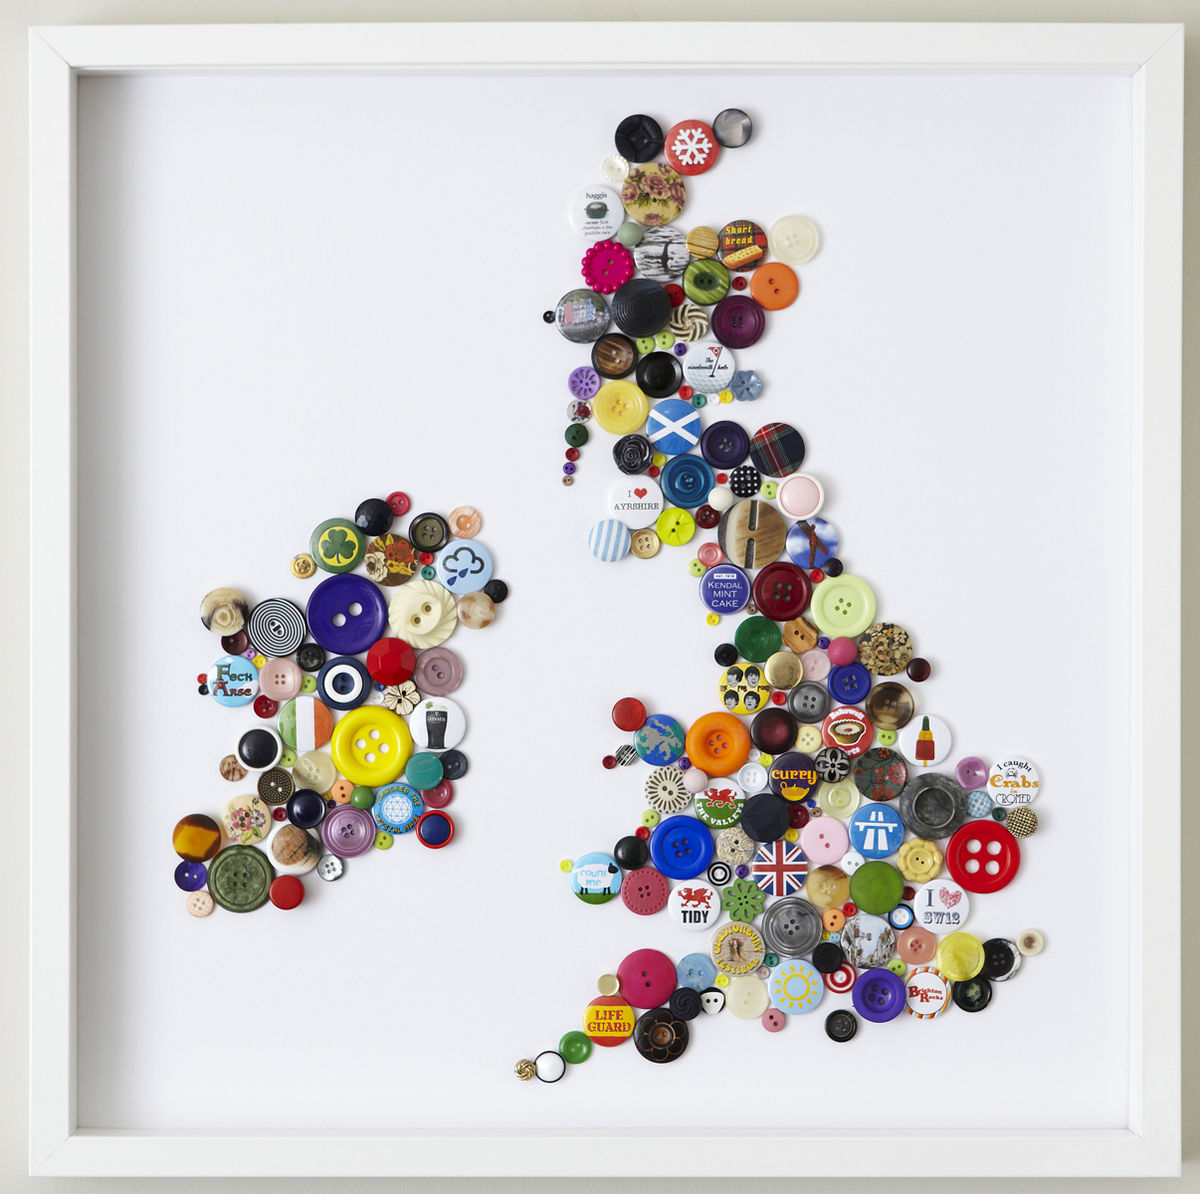 UK_LOW_RES_massive.jpg